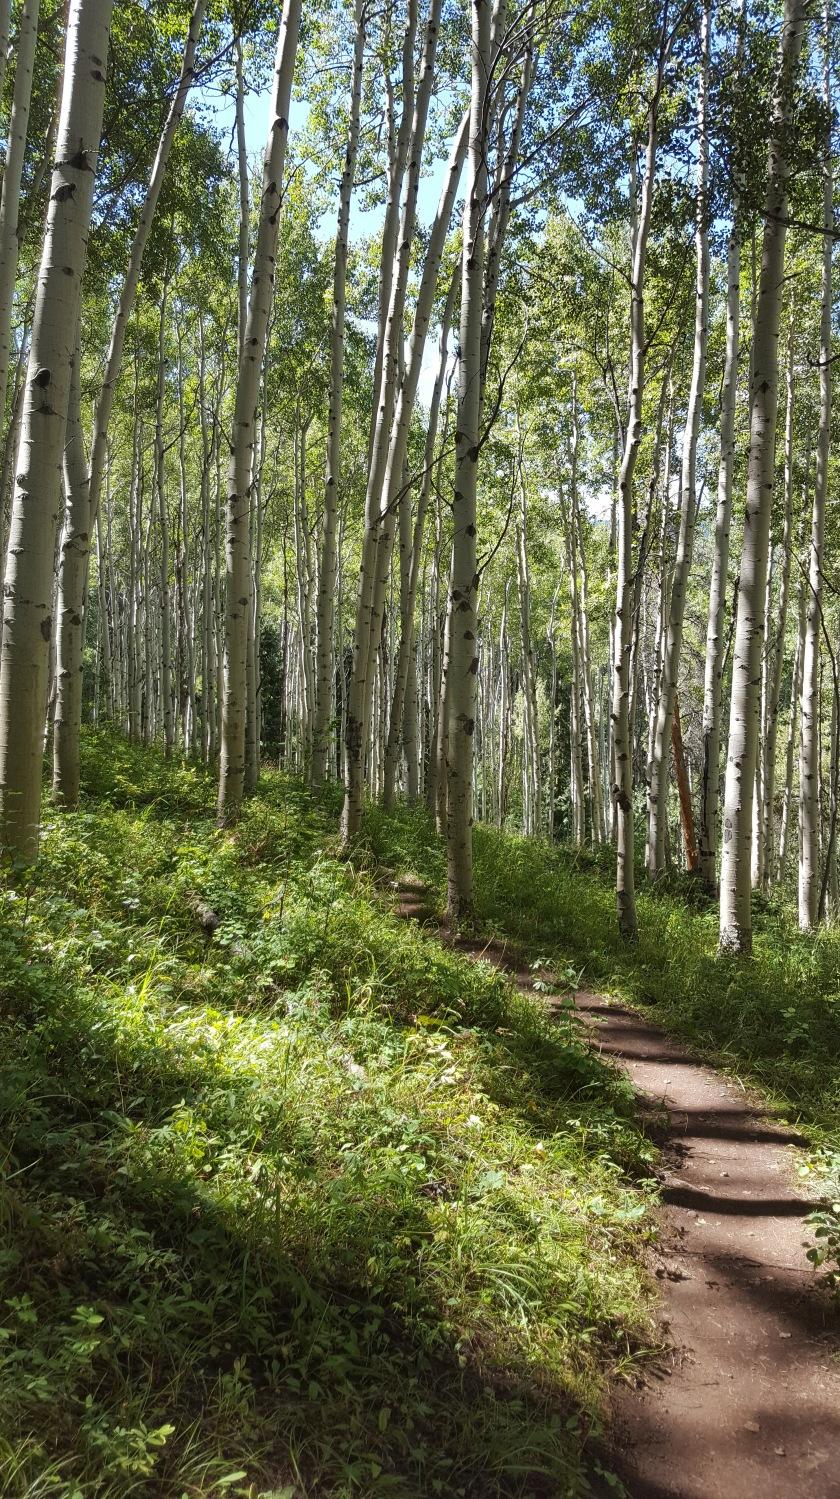 Path in Aspen forest, Beaver Creek, CO vertical